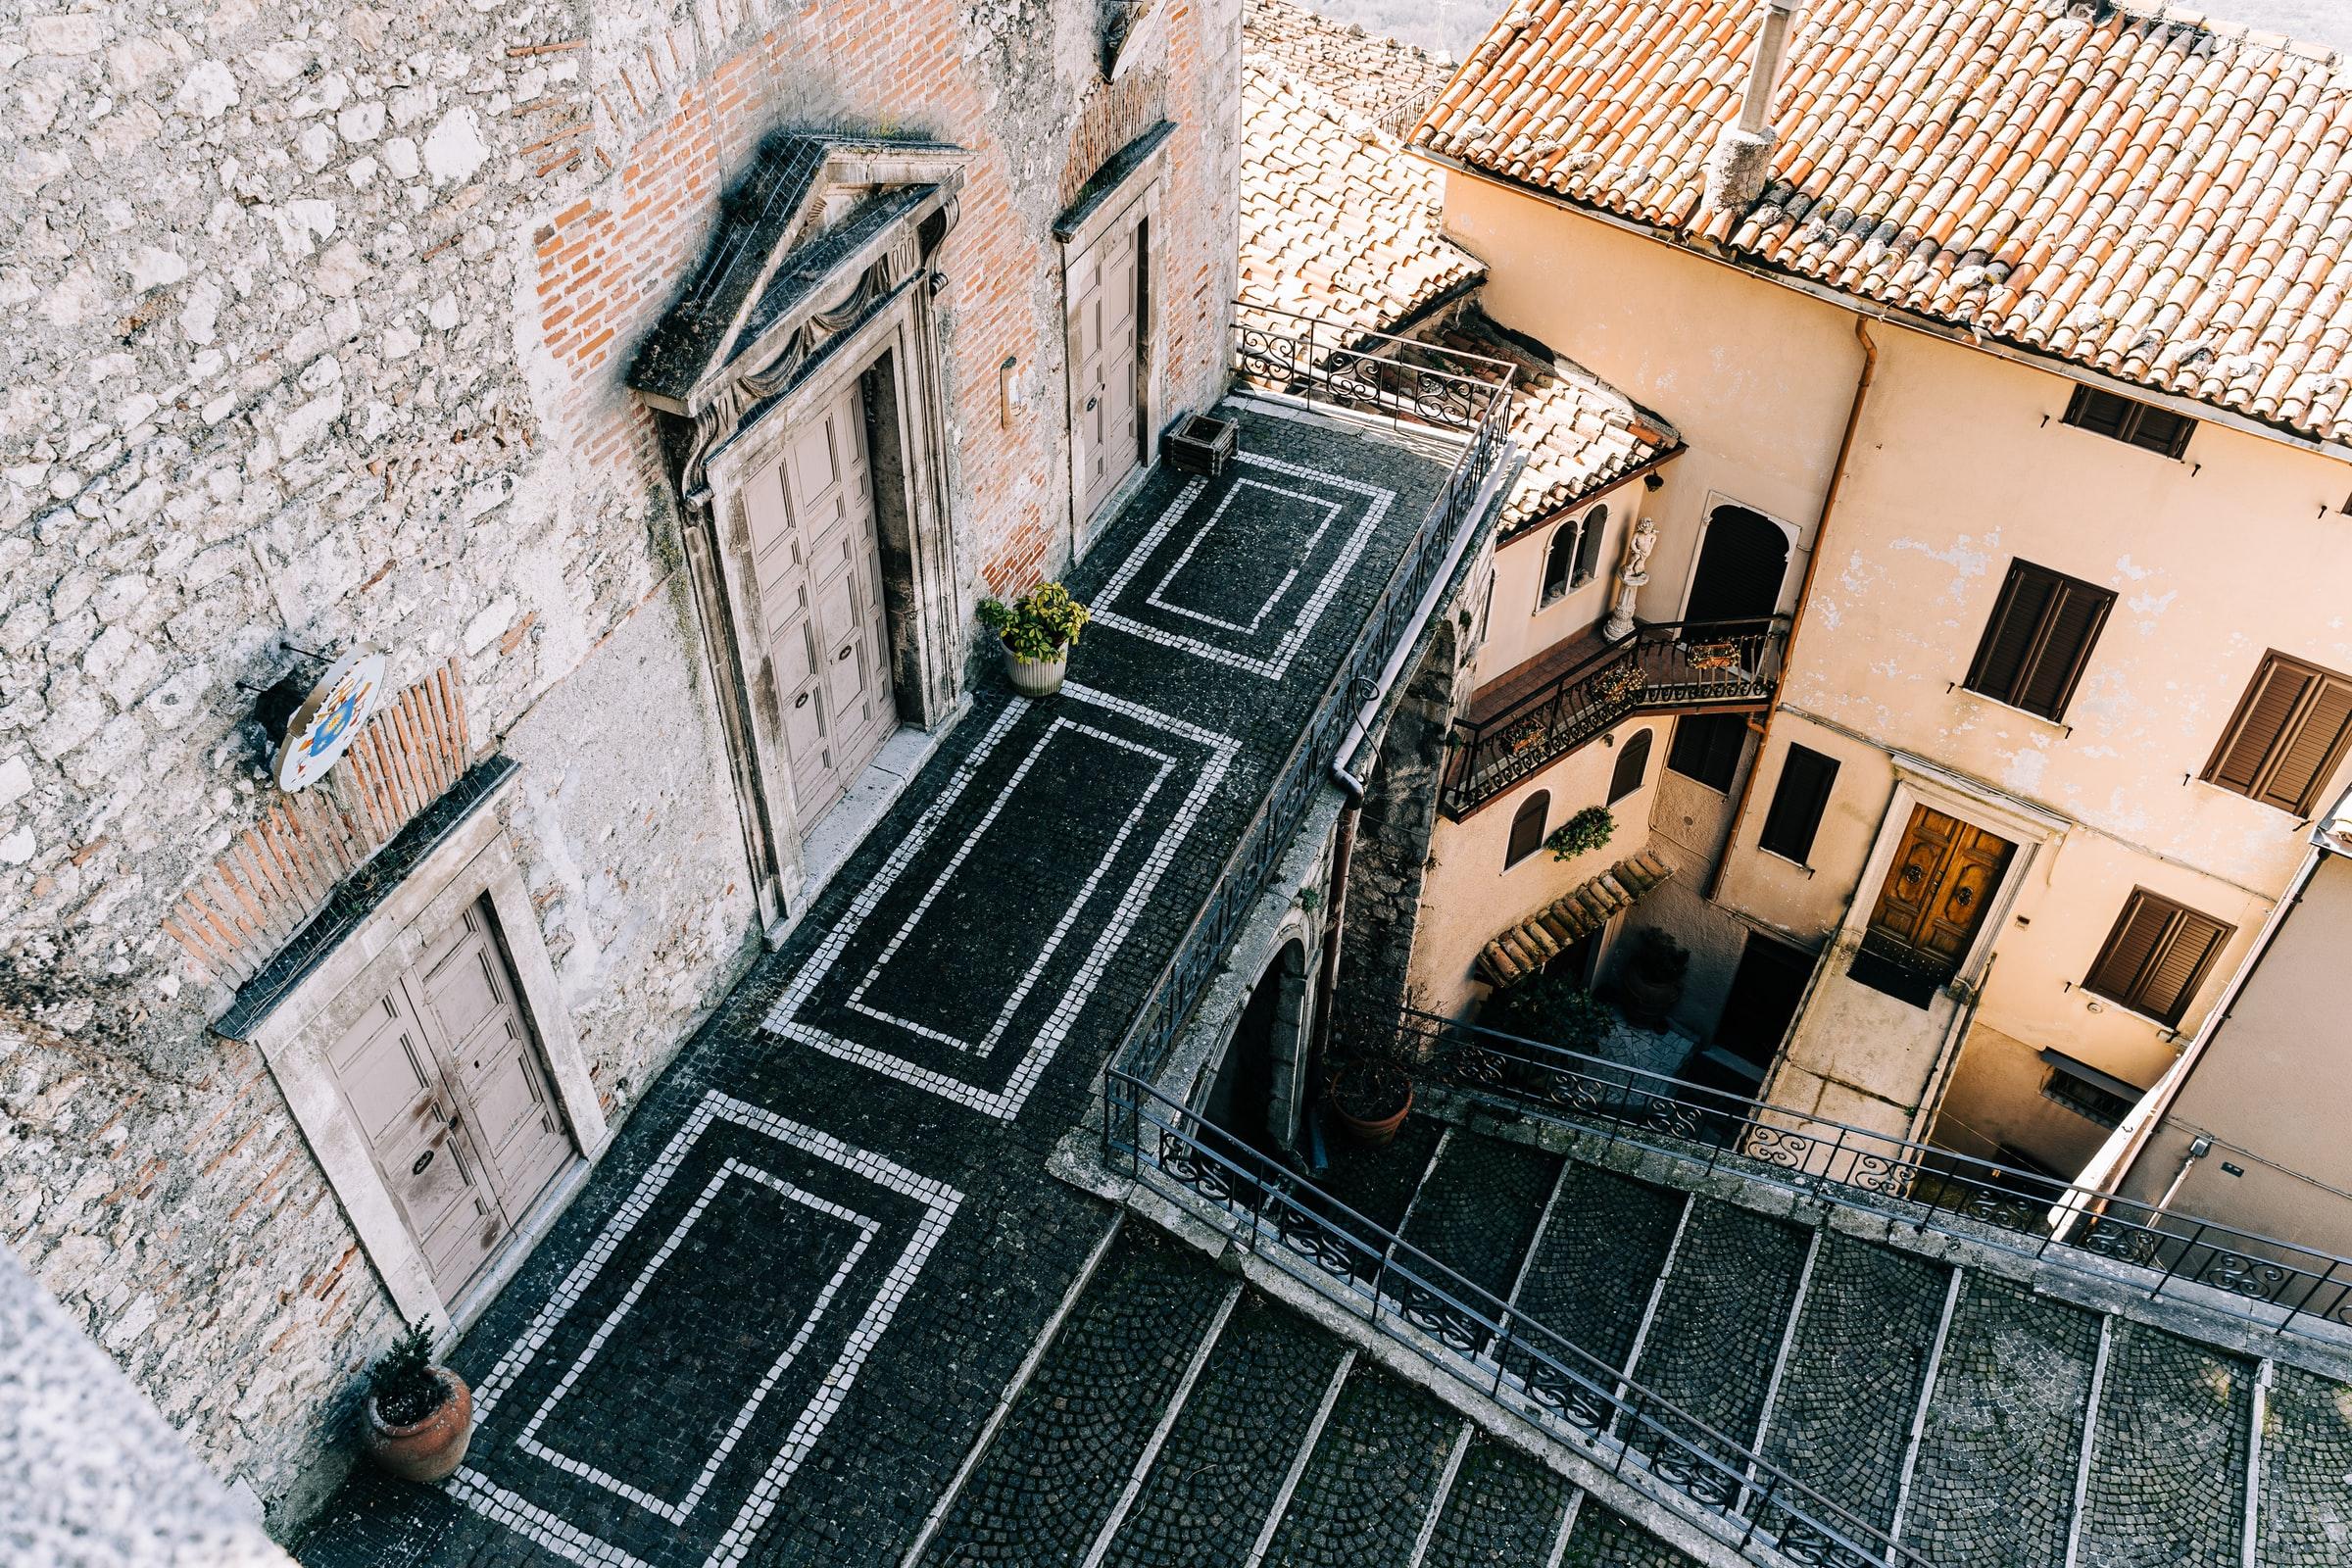 turismo religioso in italia